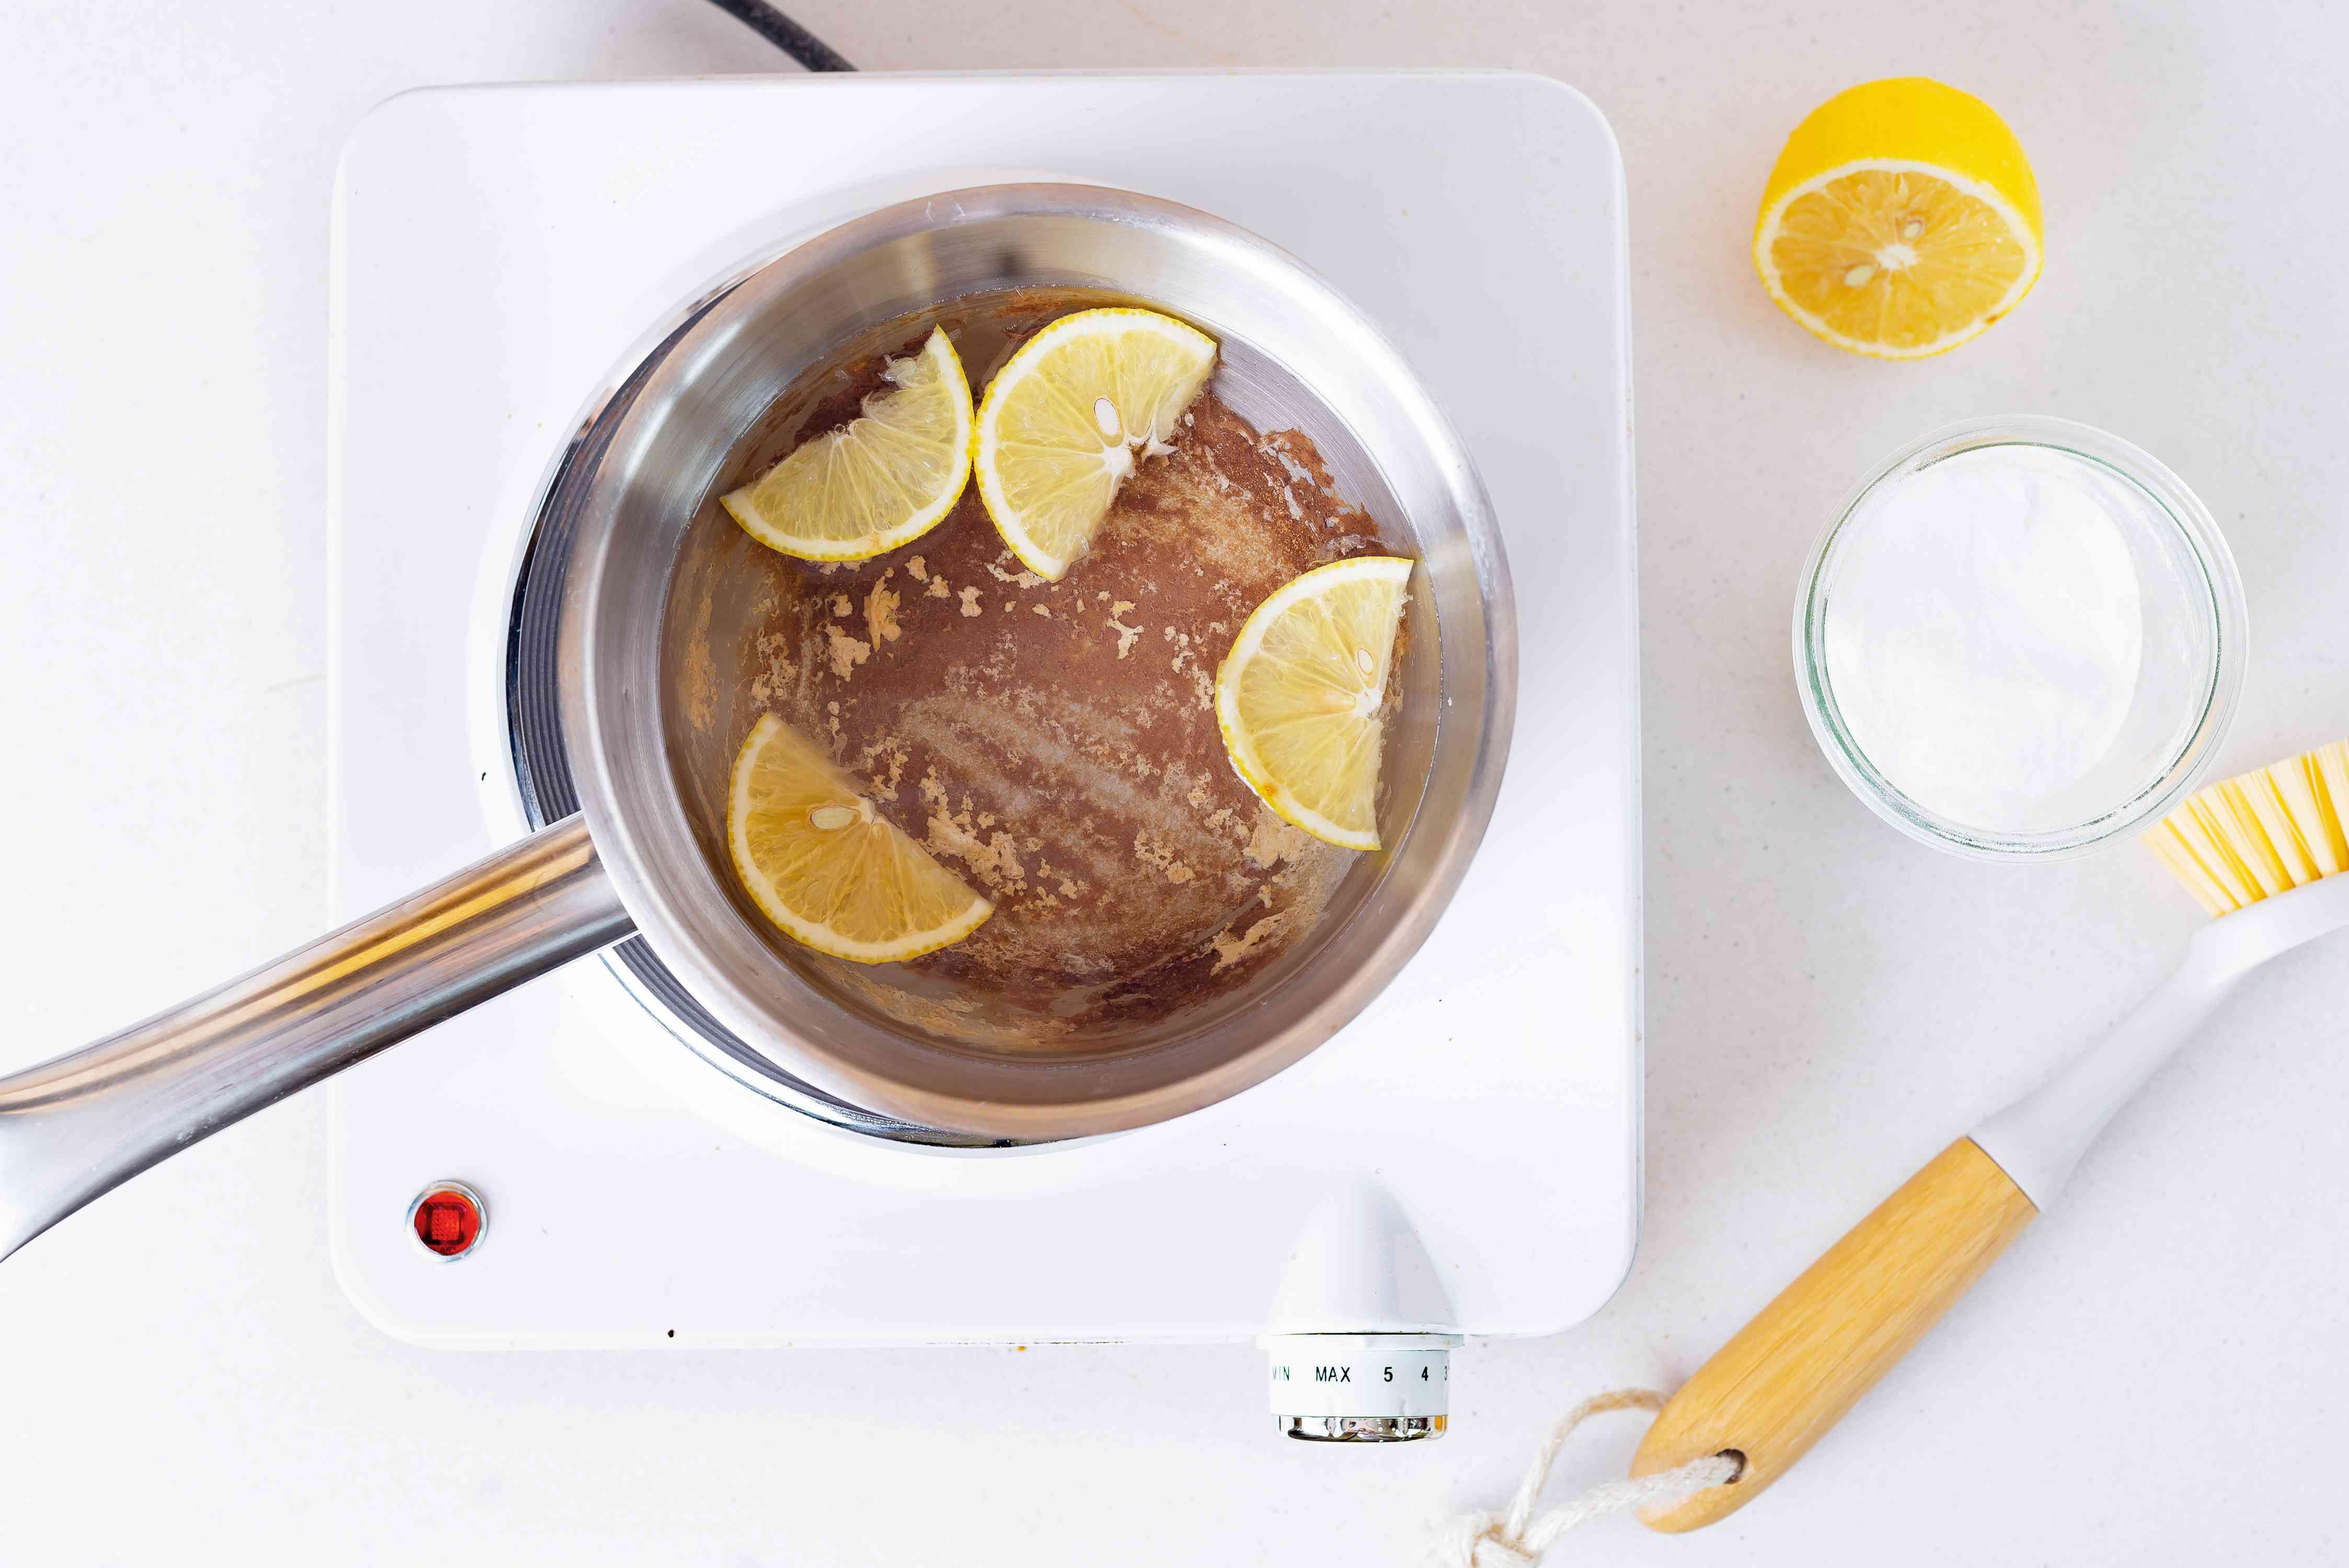 Baking soda and lemon slices in stainless steel pot heated on portable burner